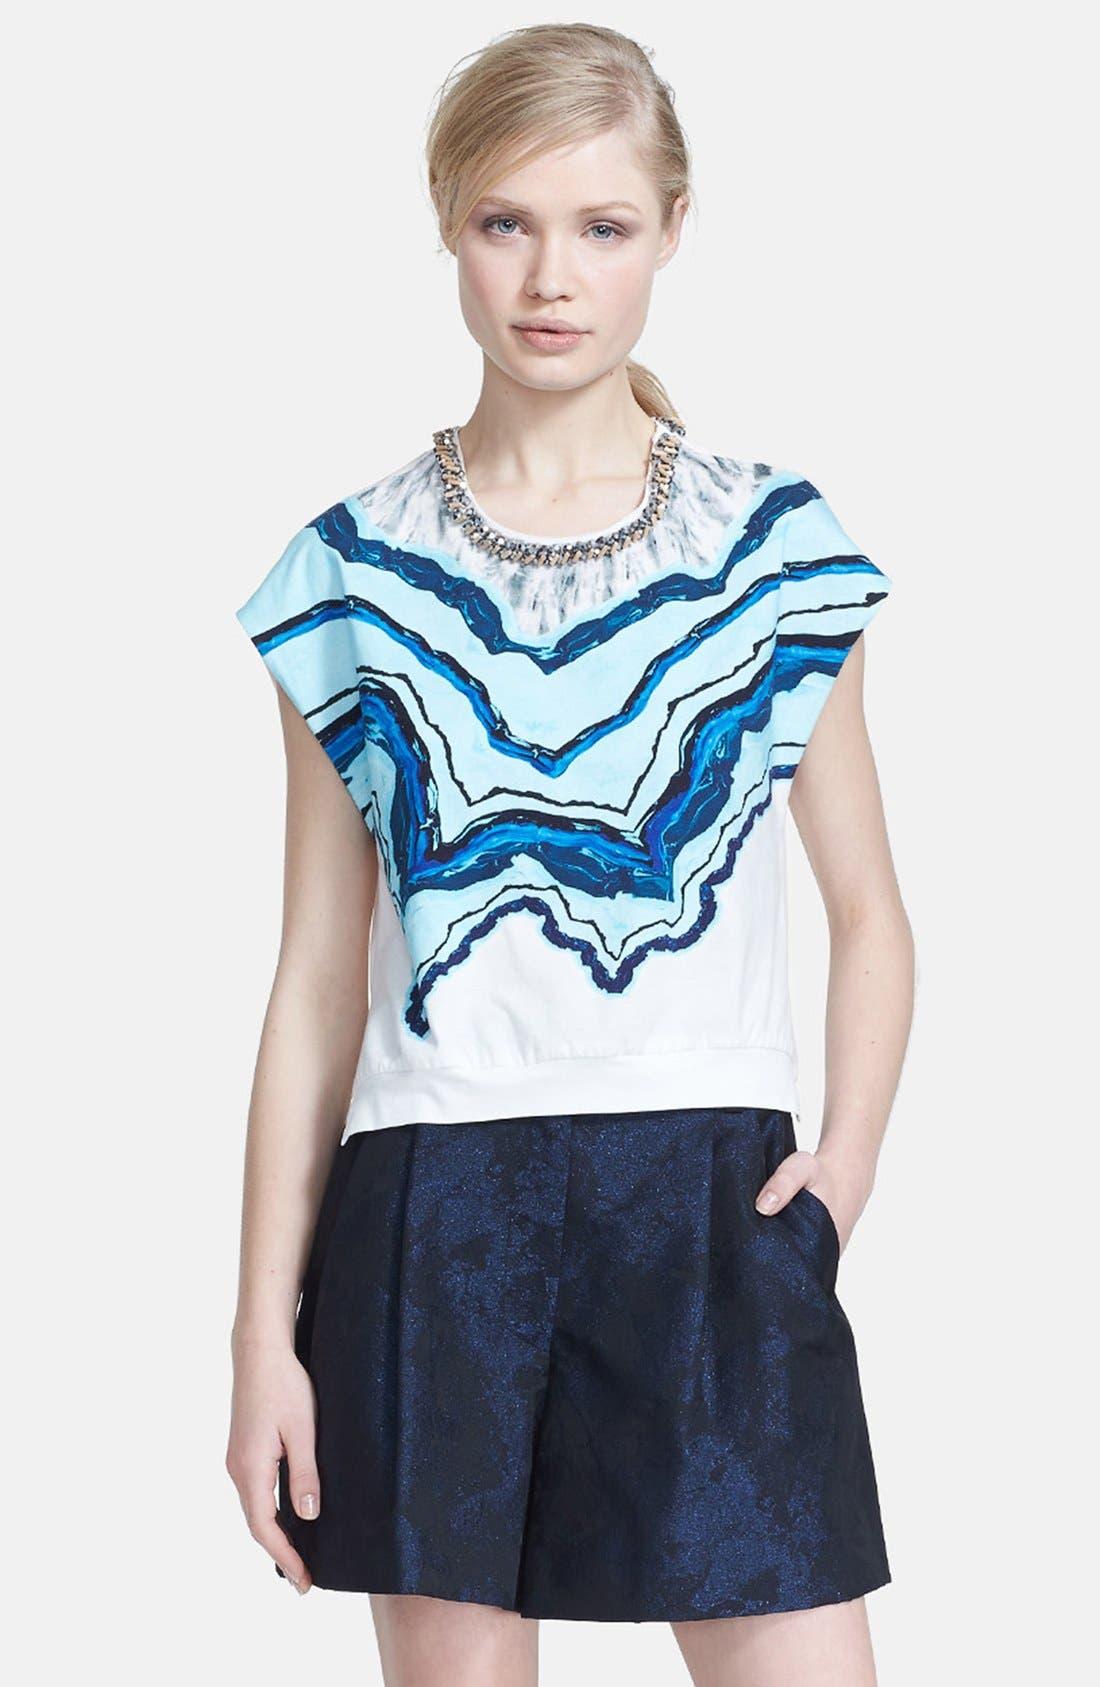 Alternate Image 1 Selected - 3.1 Phillip Lim Beaded Neck Print Cotton Top